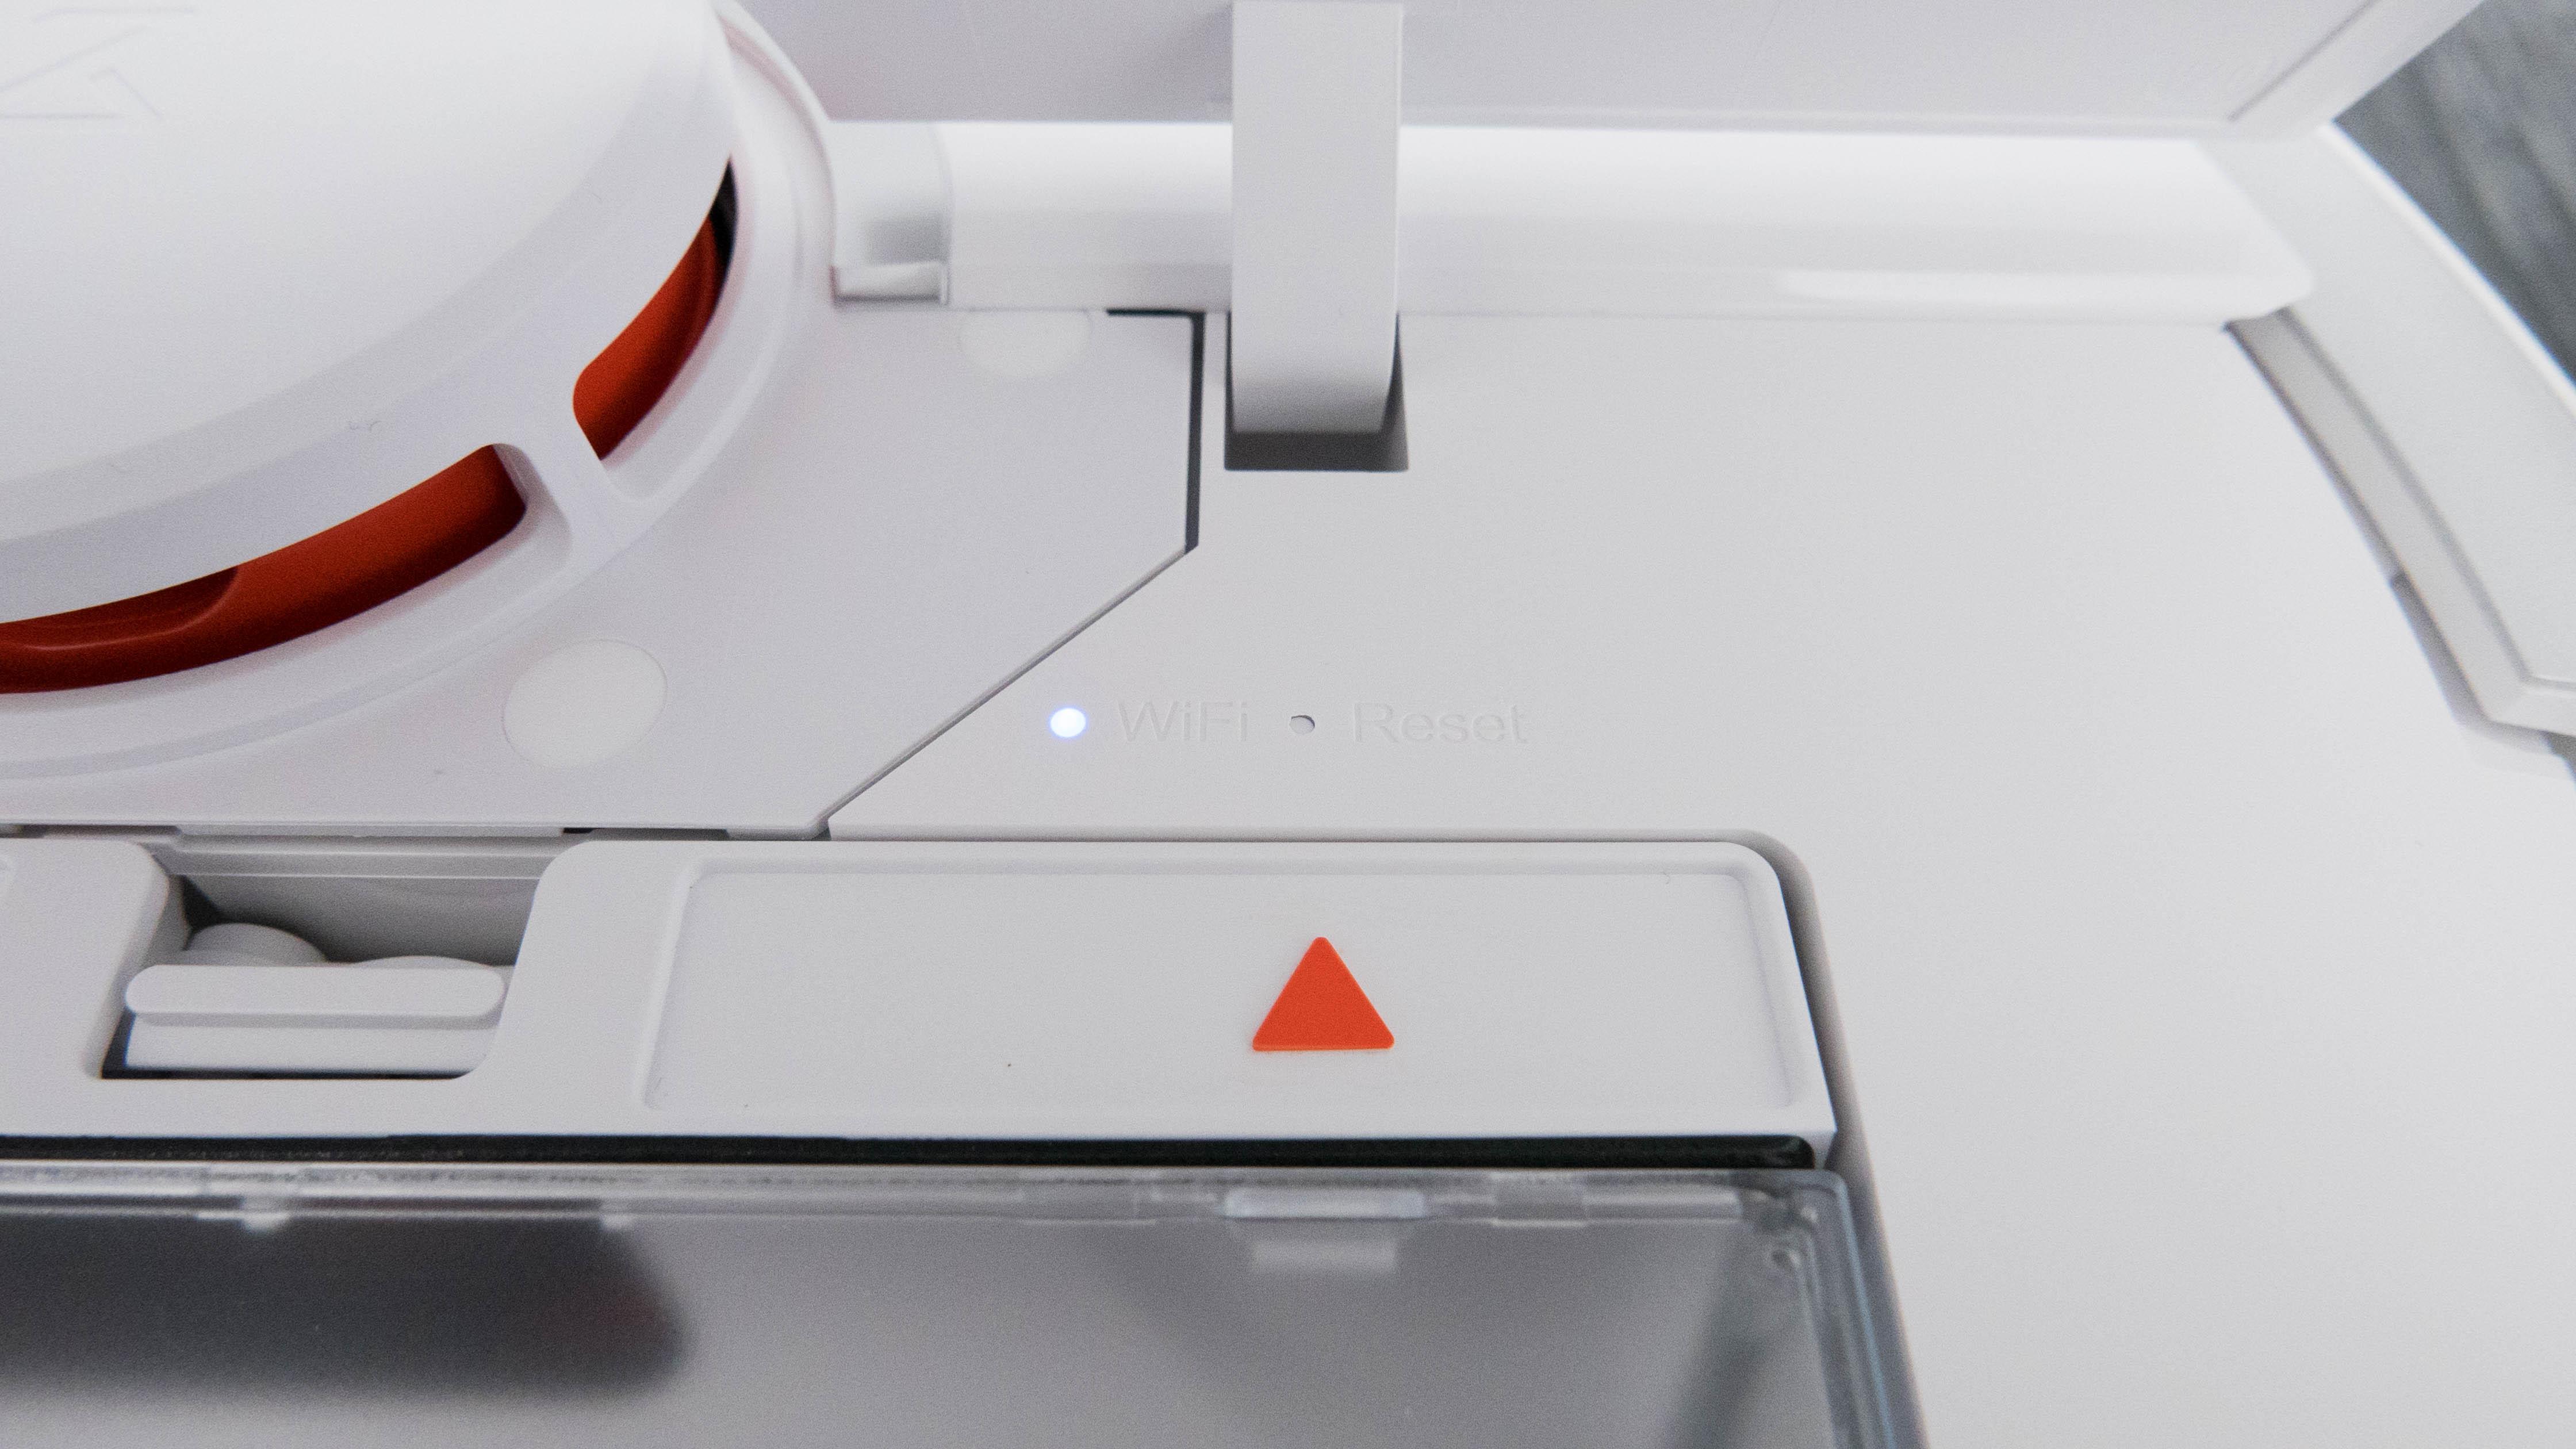 Xiaomi Mi Robot 2 Roborock S50 Roboter Details 23